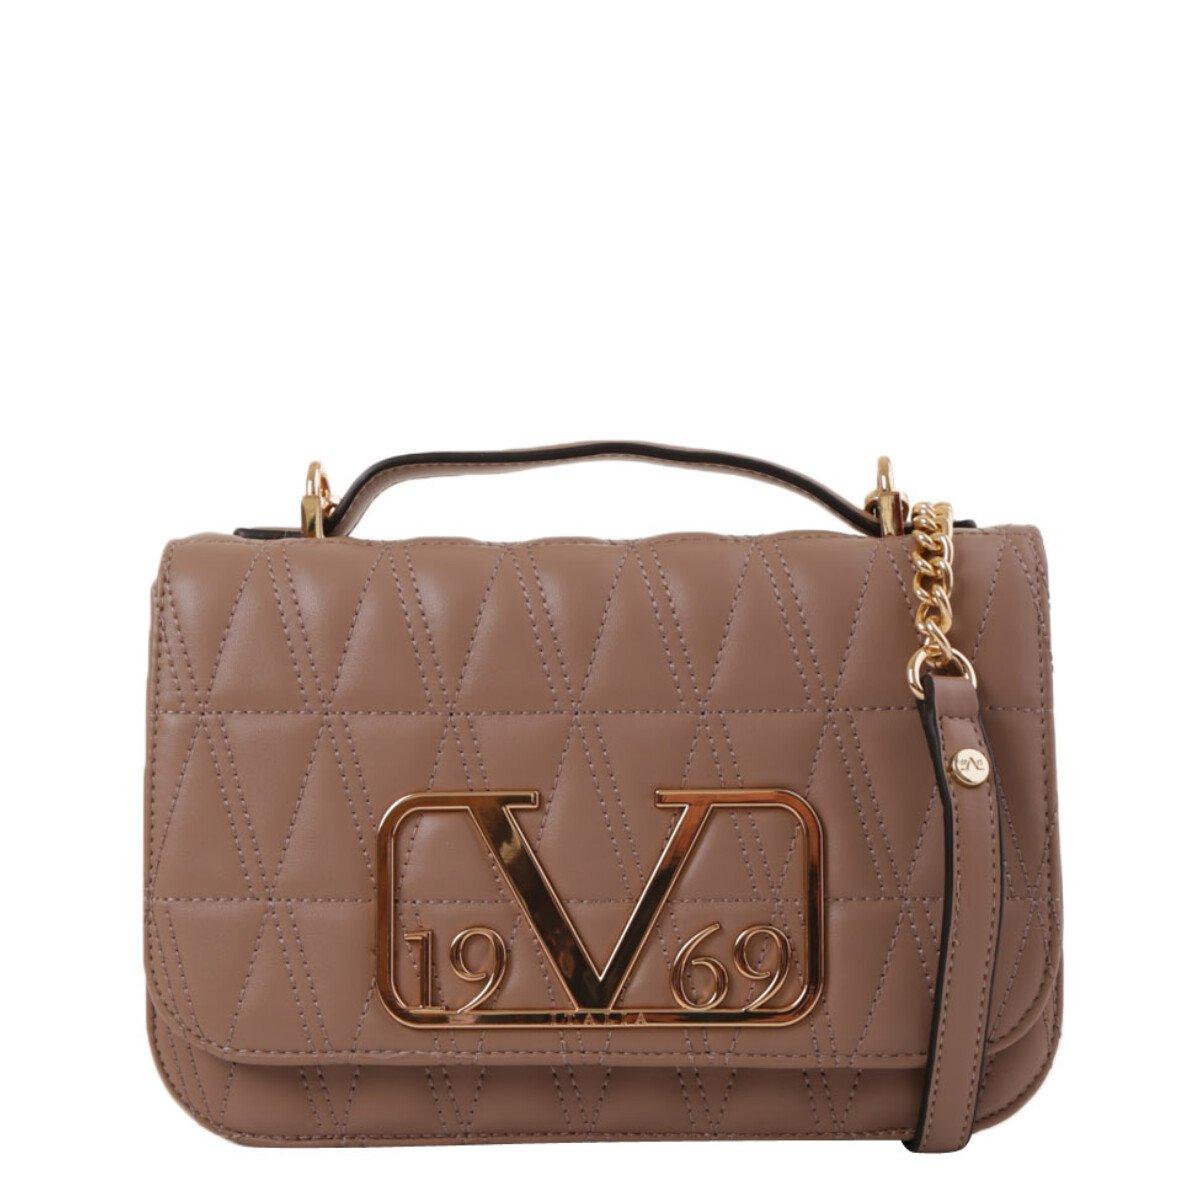 19v69 Italia Women's Shoulder Bag Various Colours 318906 - beige UNICA